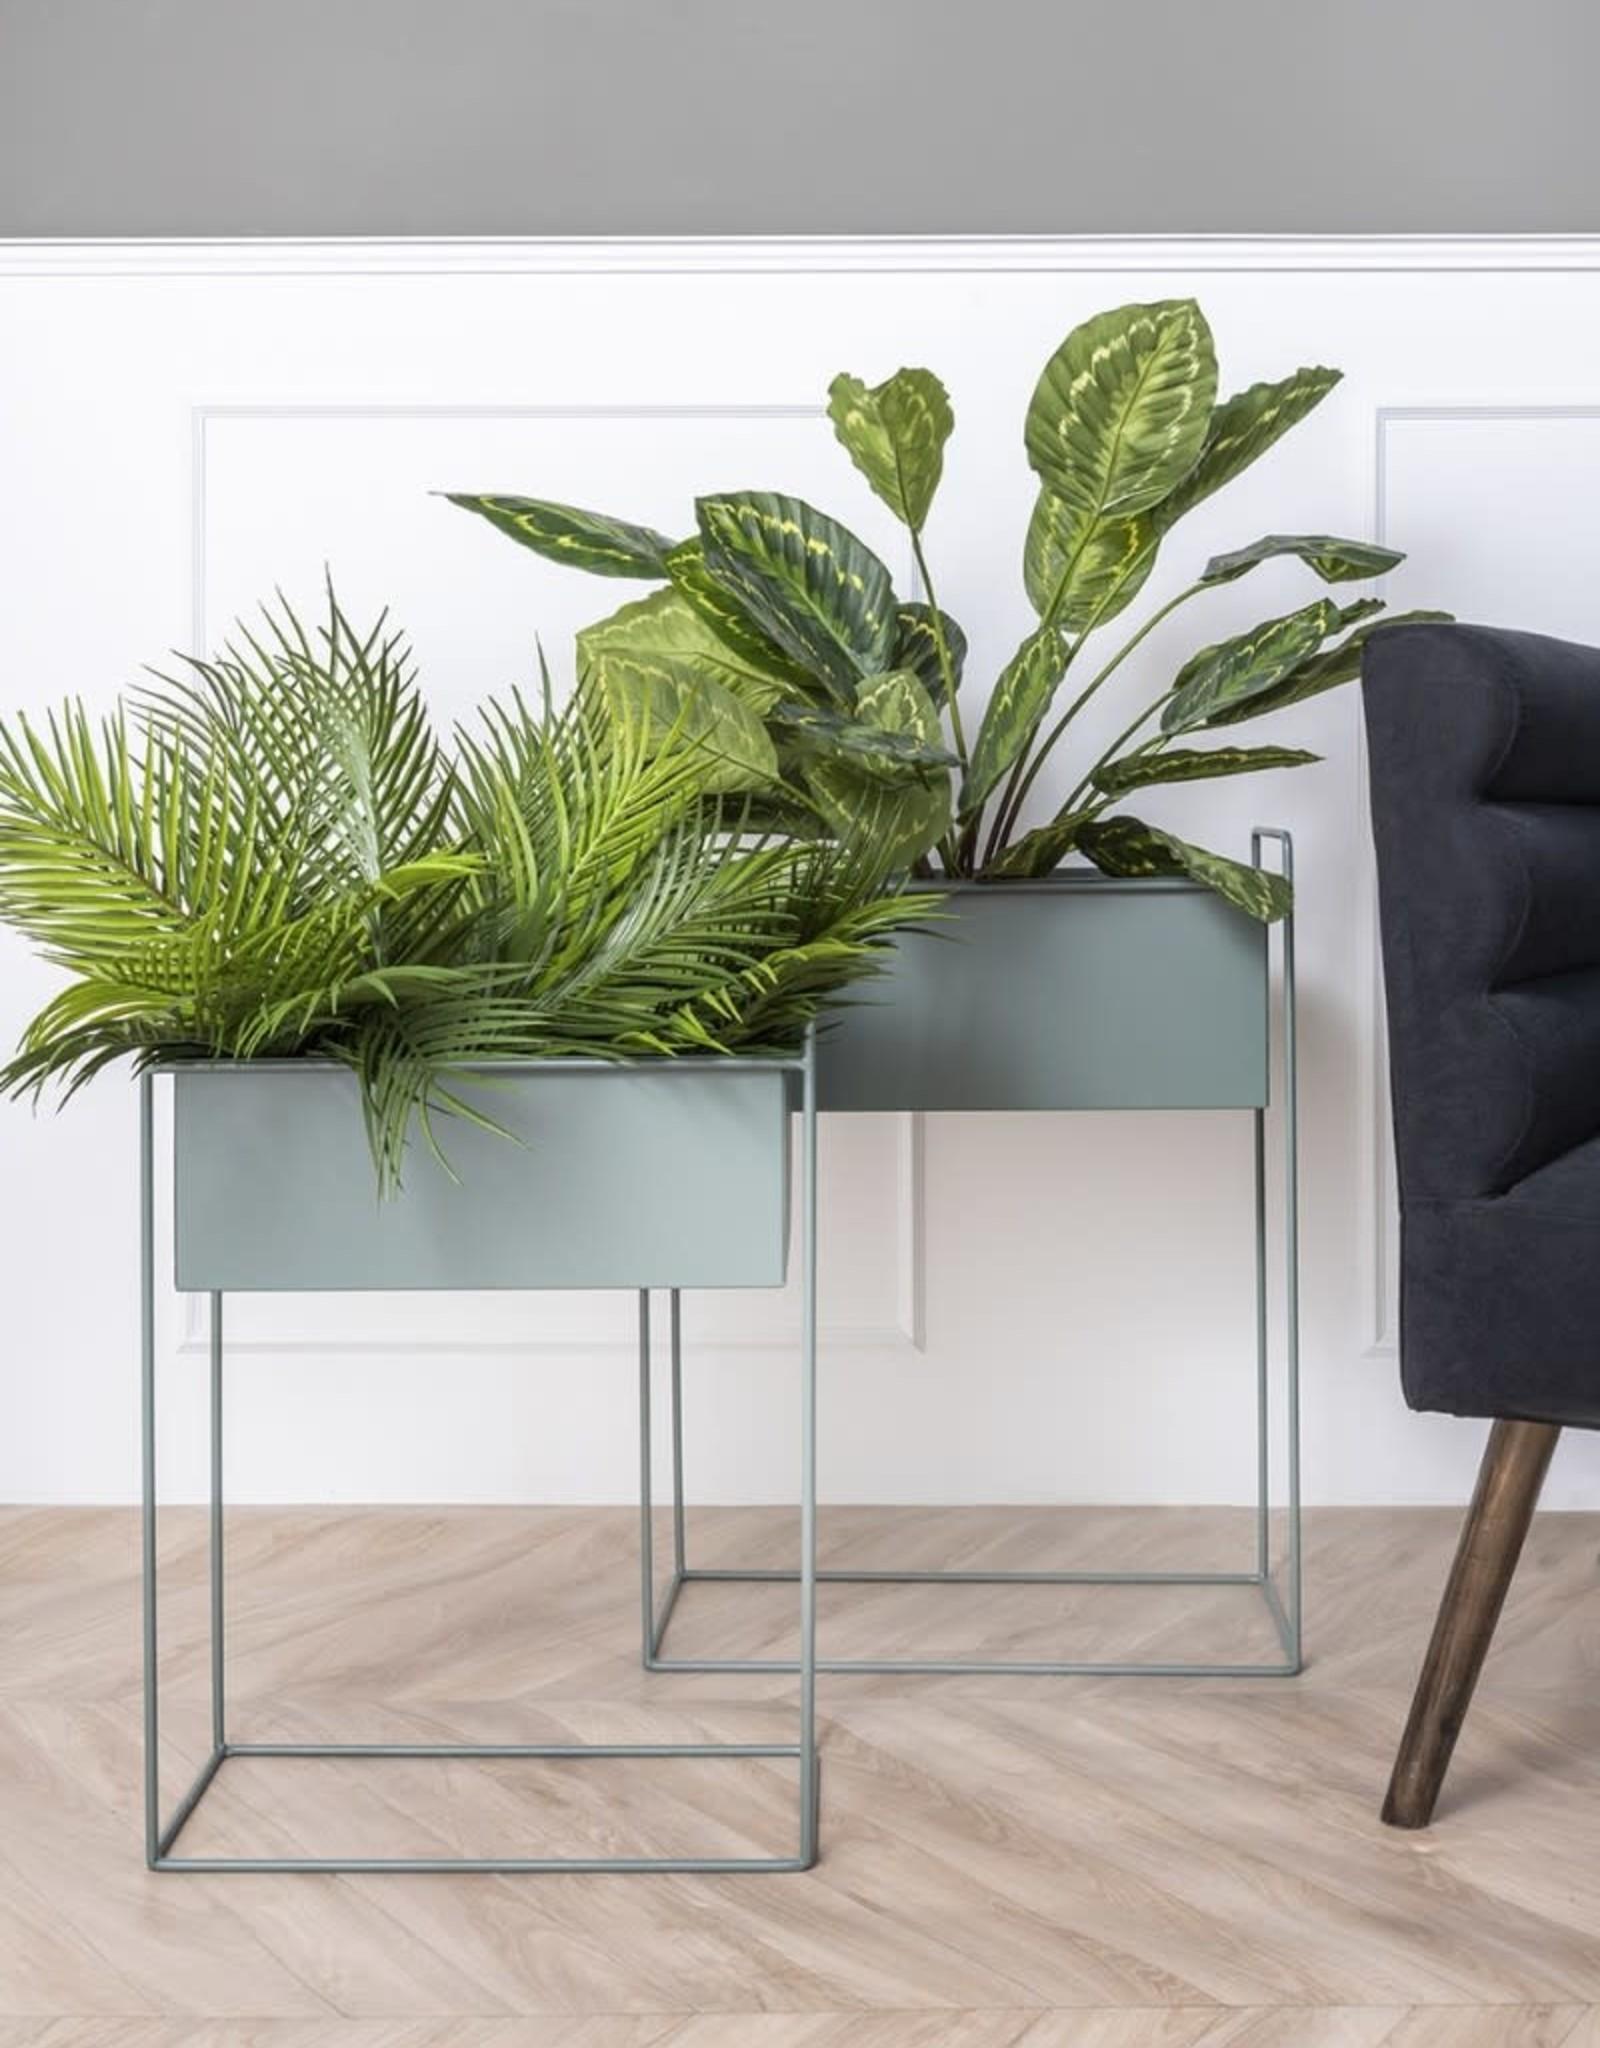 pt Iron planter on stand M [straight] 43 x 19,5 x 55cm - Jungle green